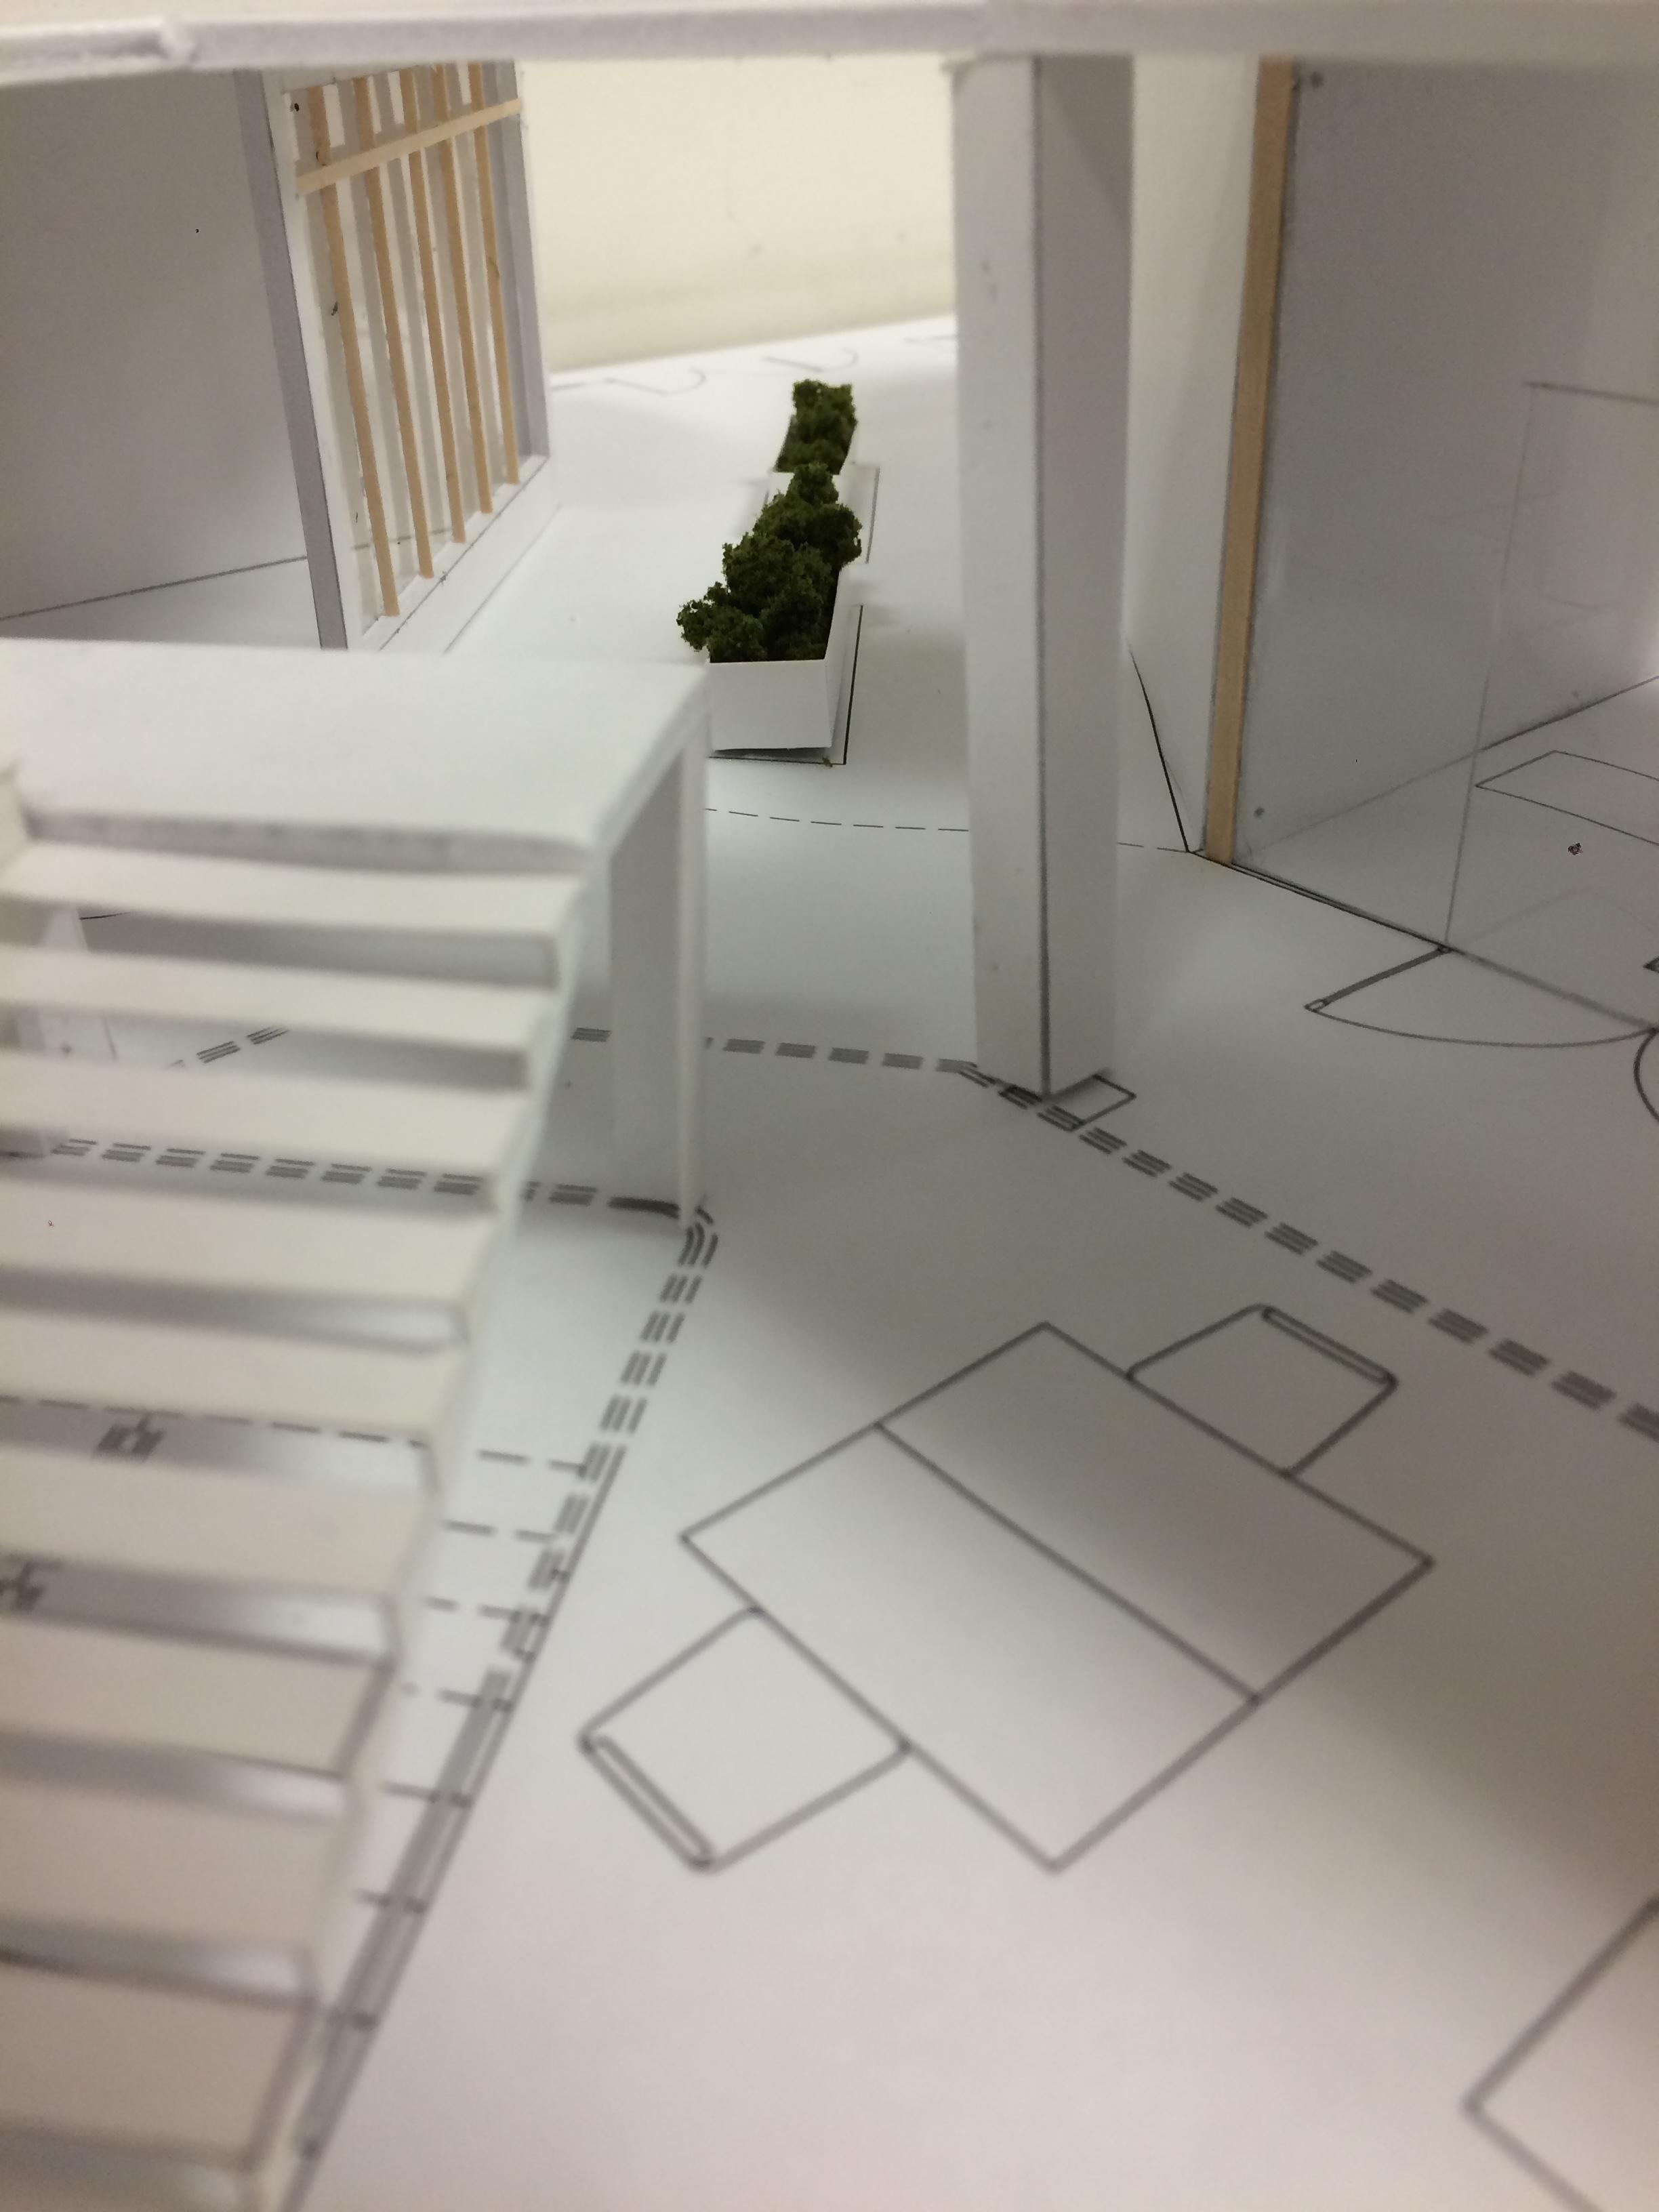 Hallway with planter